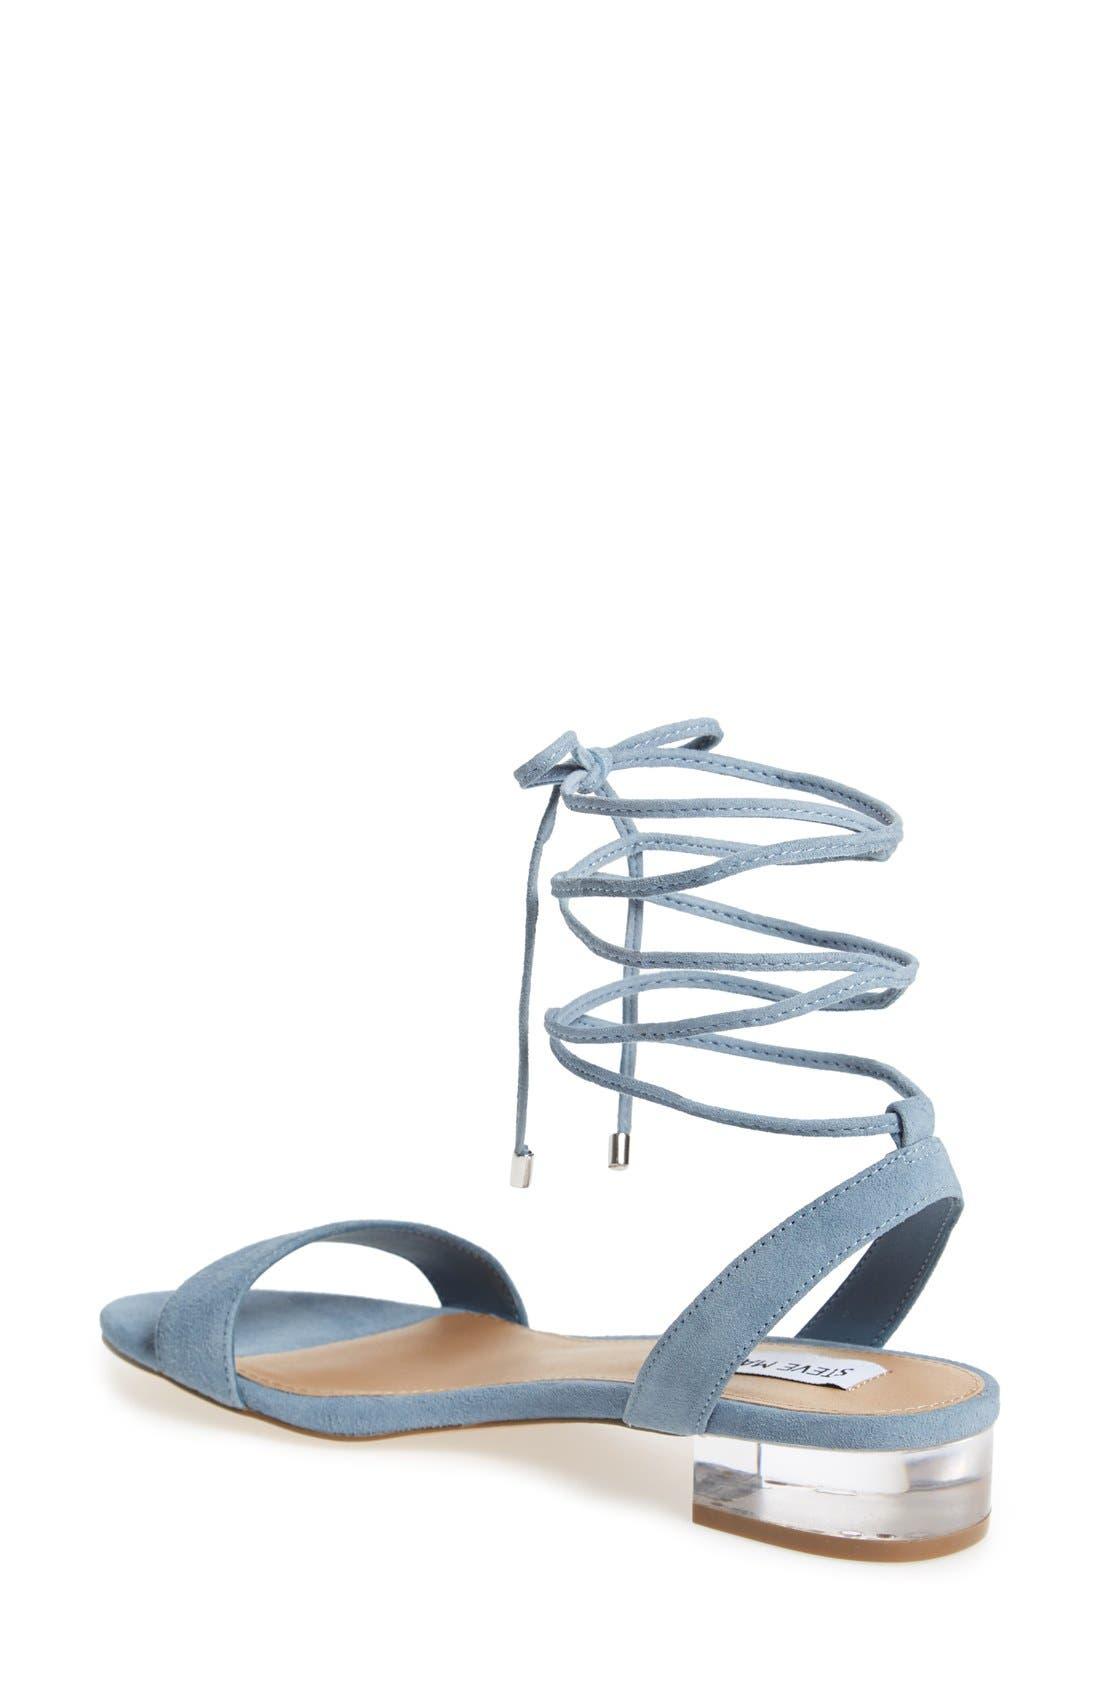 'Carolyn' Lace-Up Sandal,                             Alternate thumbnail 6, color,